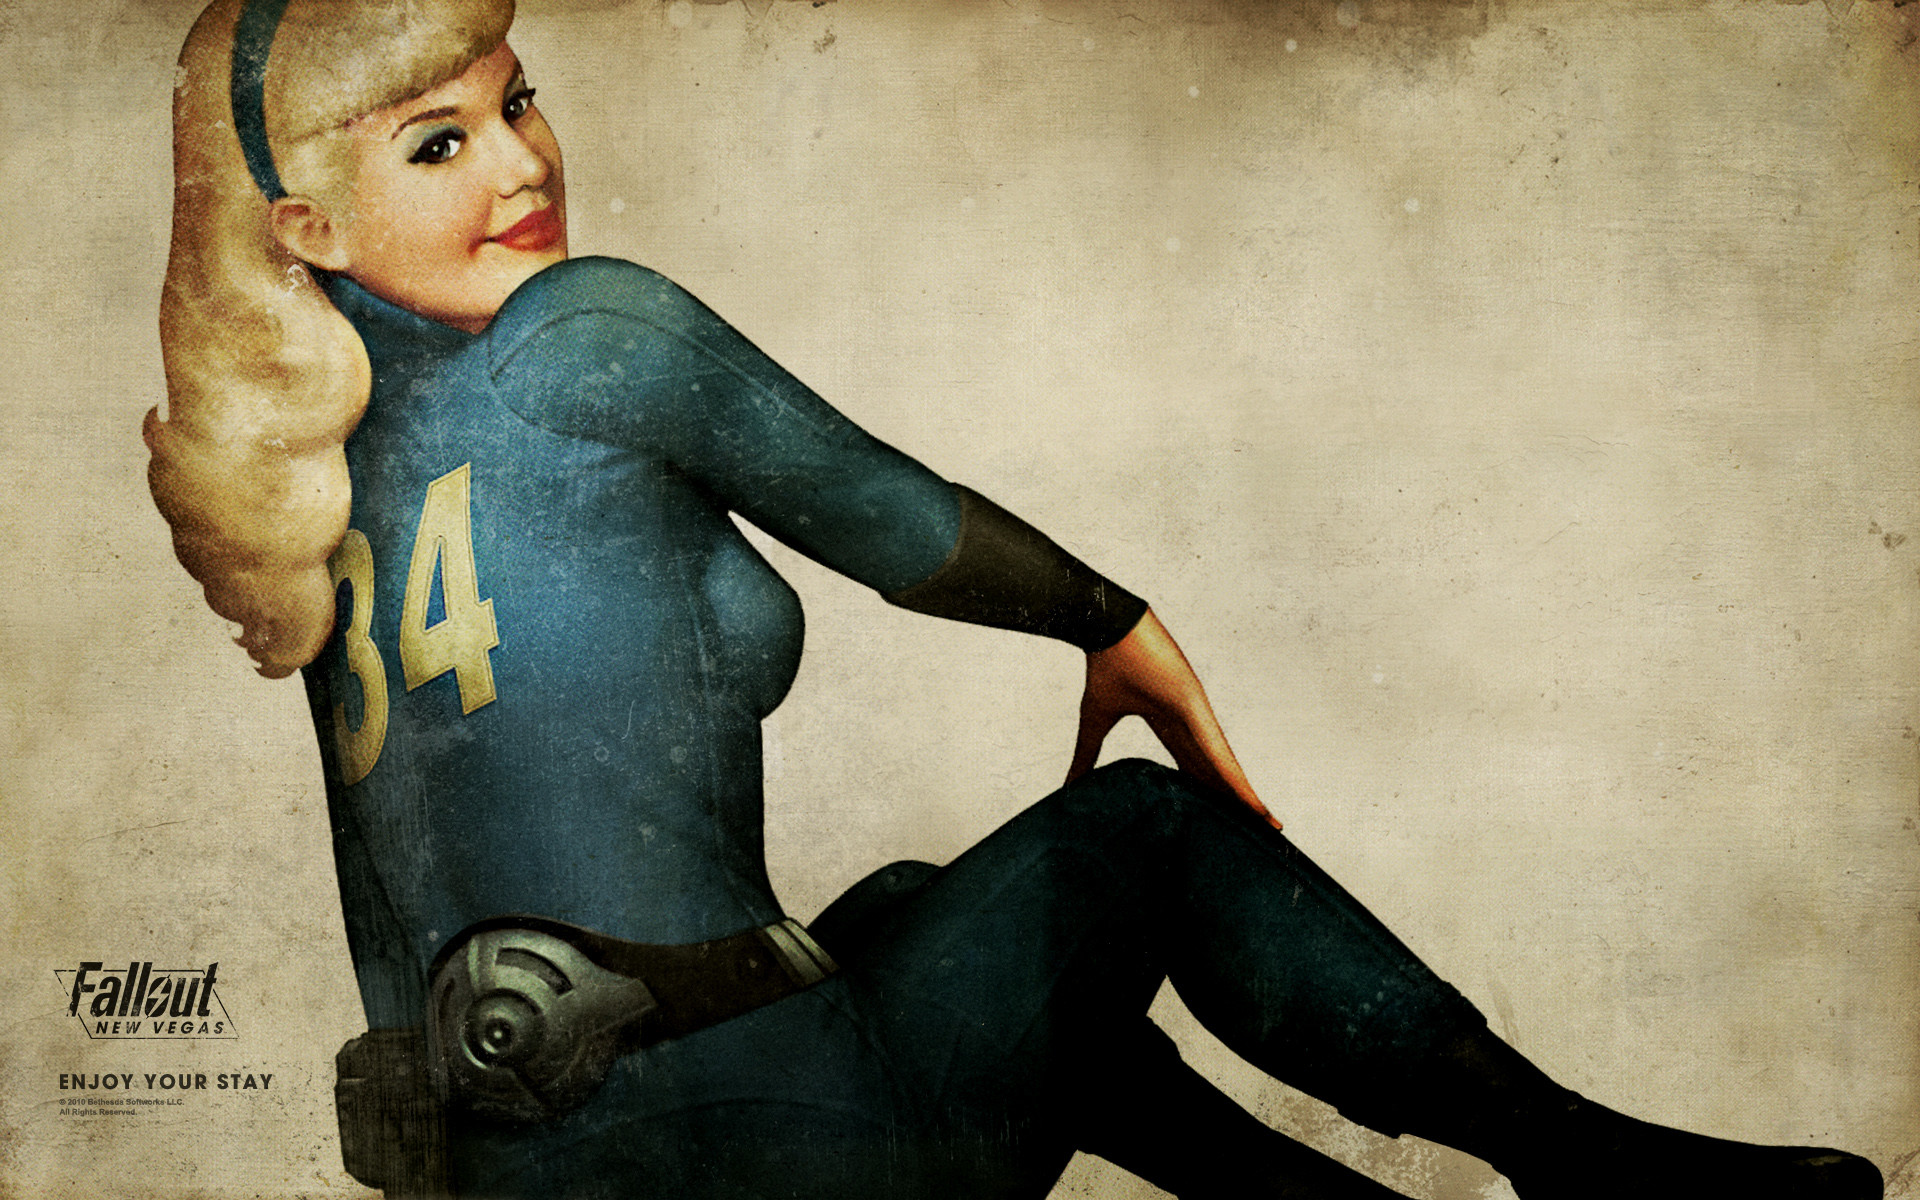 px Sexy Fallout 4 Desktop Wallpapers